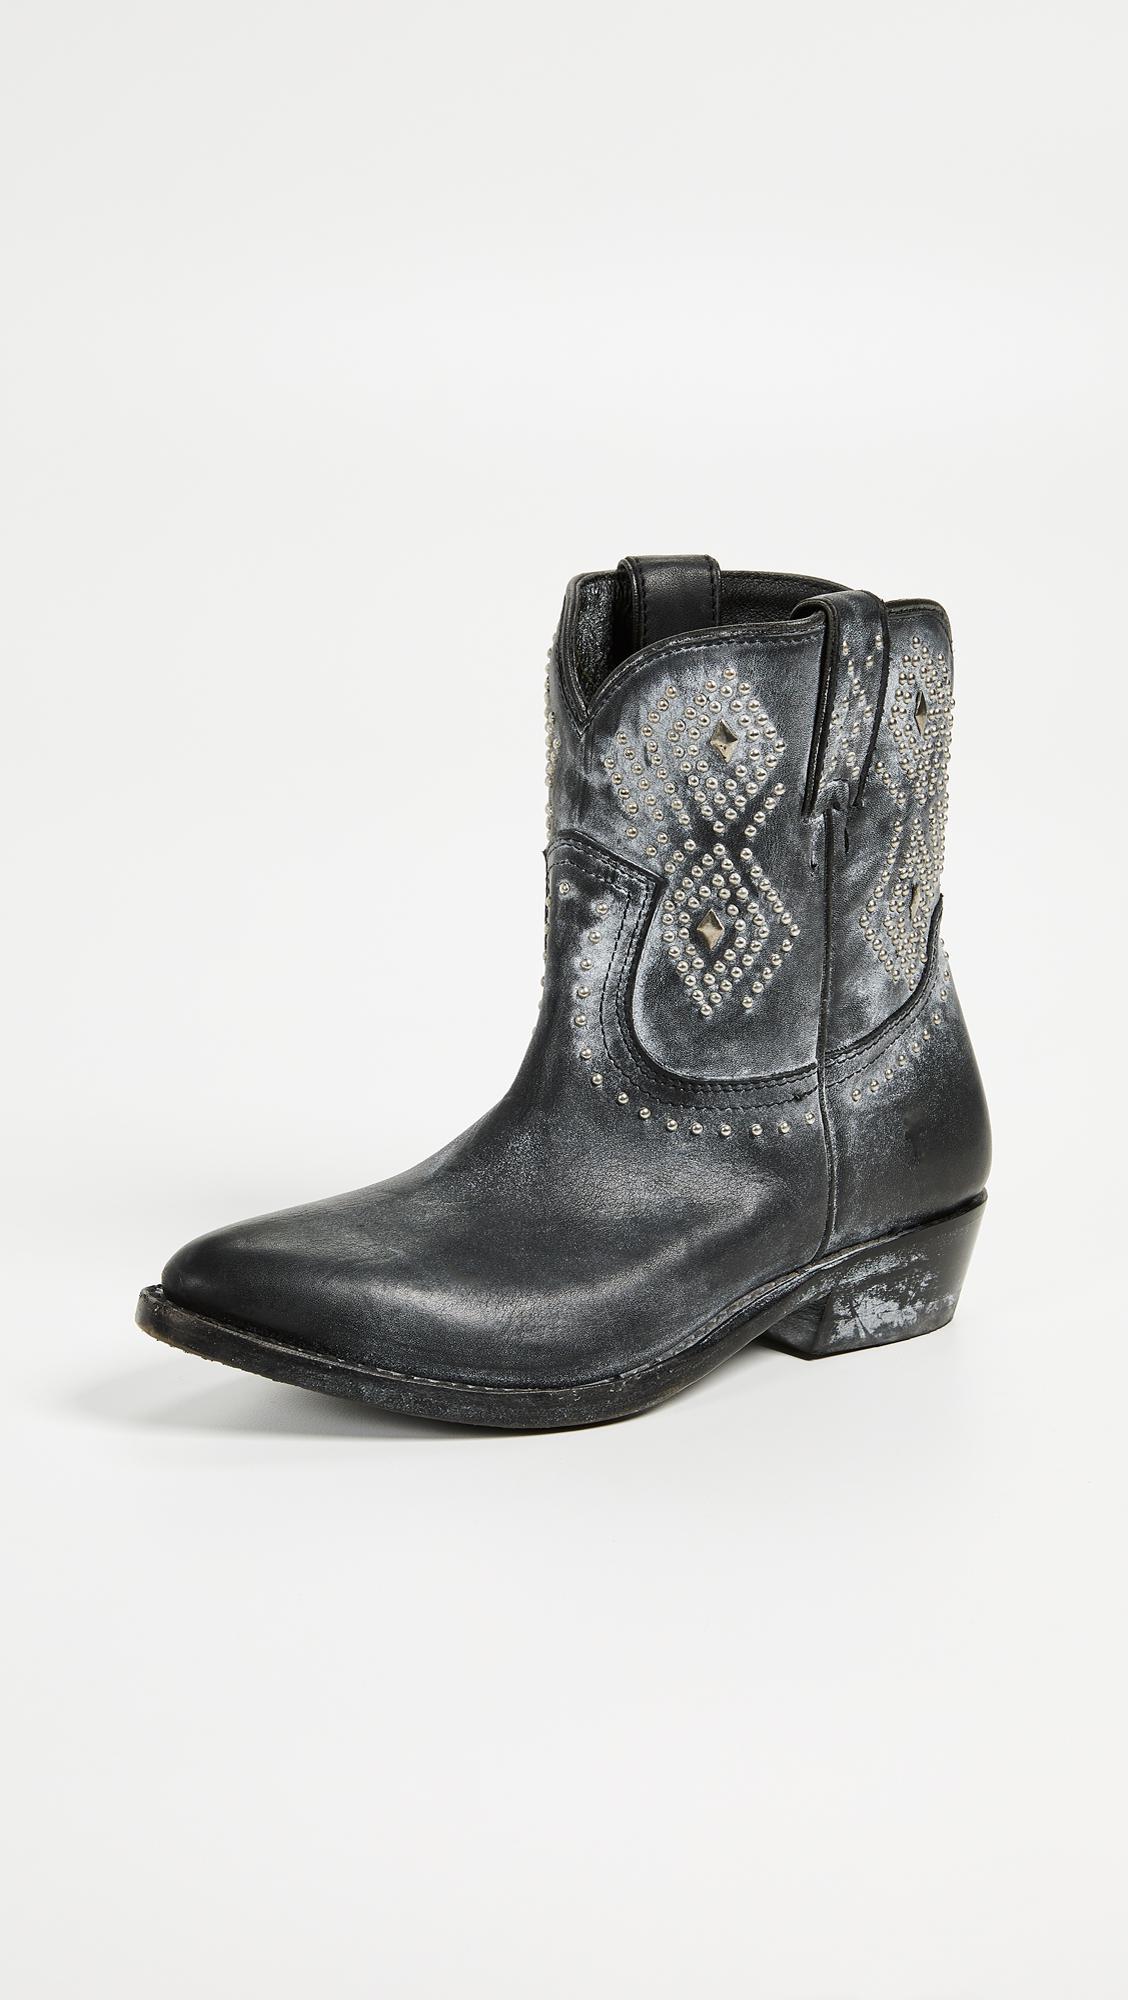 2b7fd07f5d5 Frye Billy Stud Short Boots in Black - Lyst